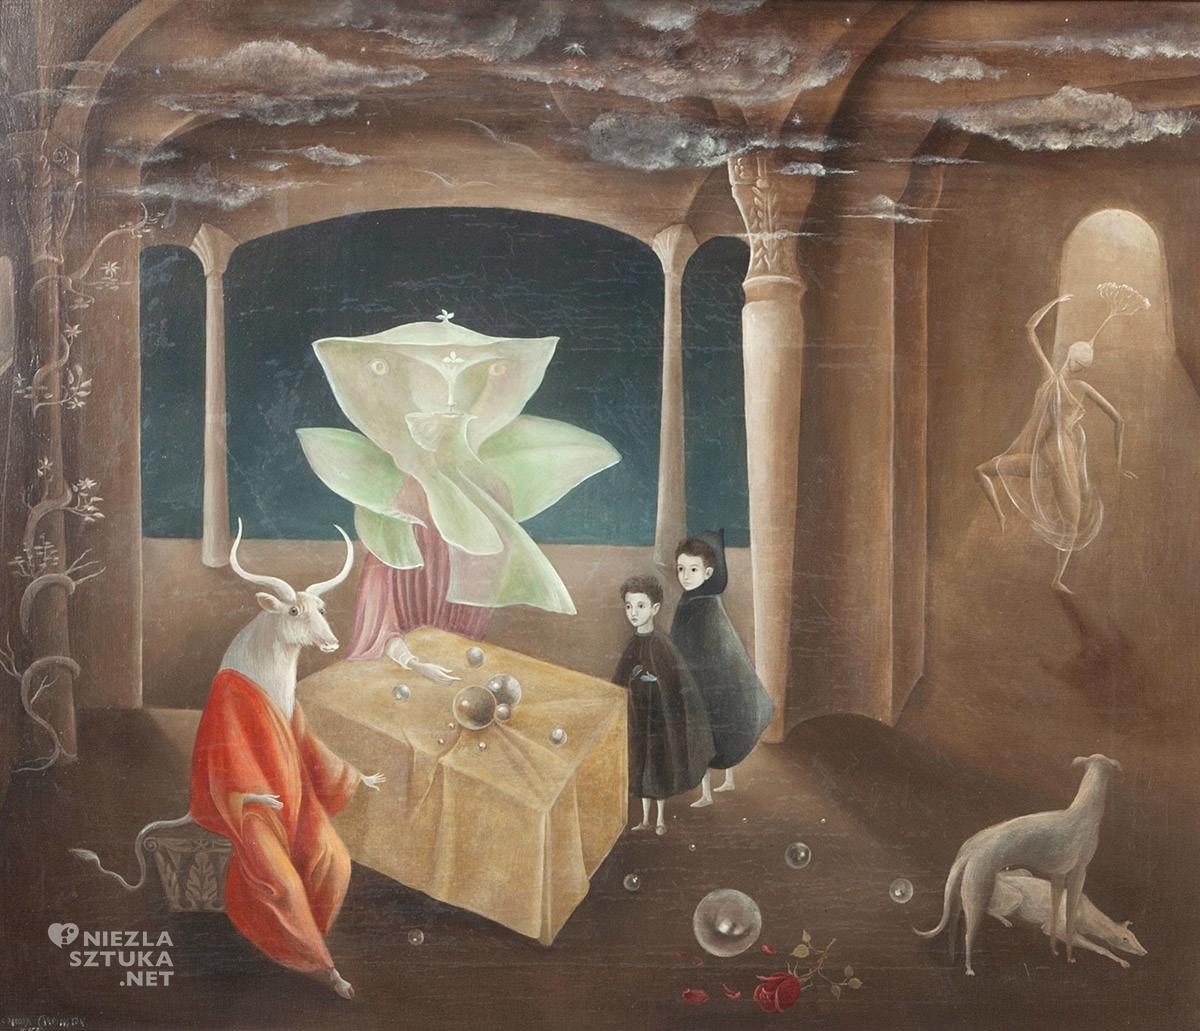 Leonora Carrington, And Then We Saw the Daughter of the Minotaur, surrealizm, kobiety w sztuce, Niezła Sztuka